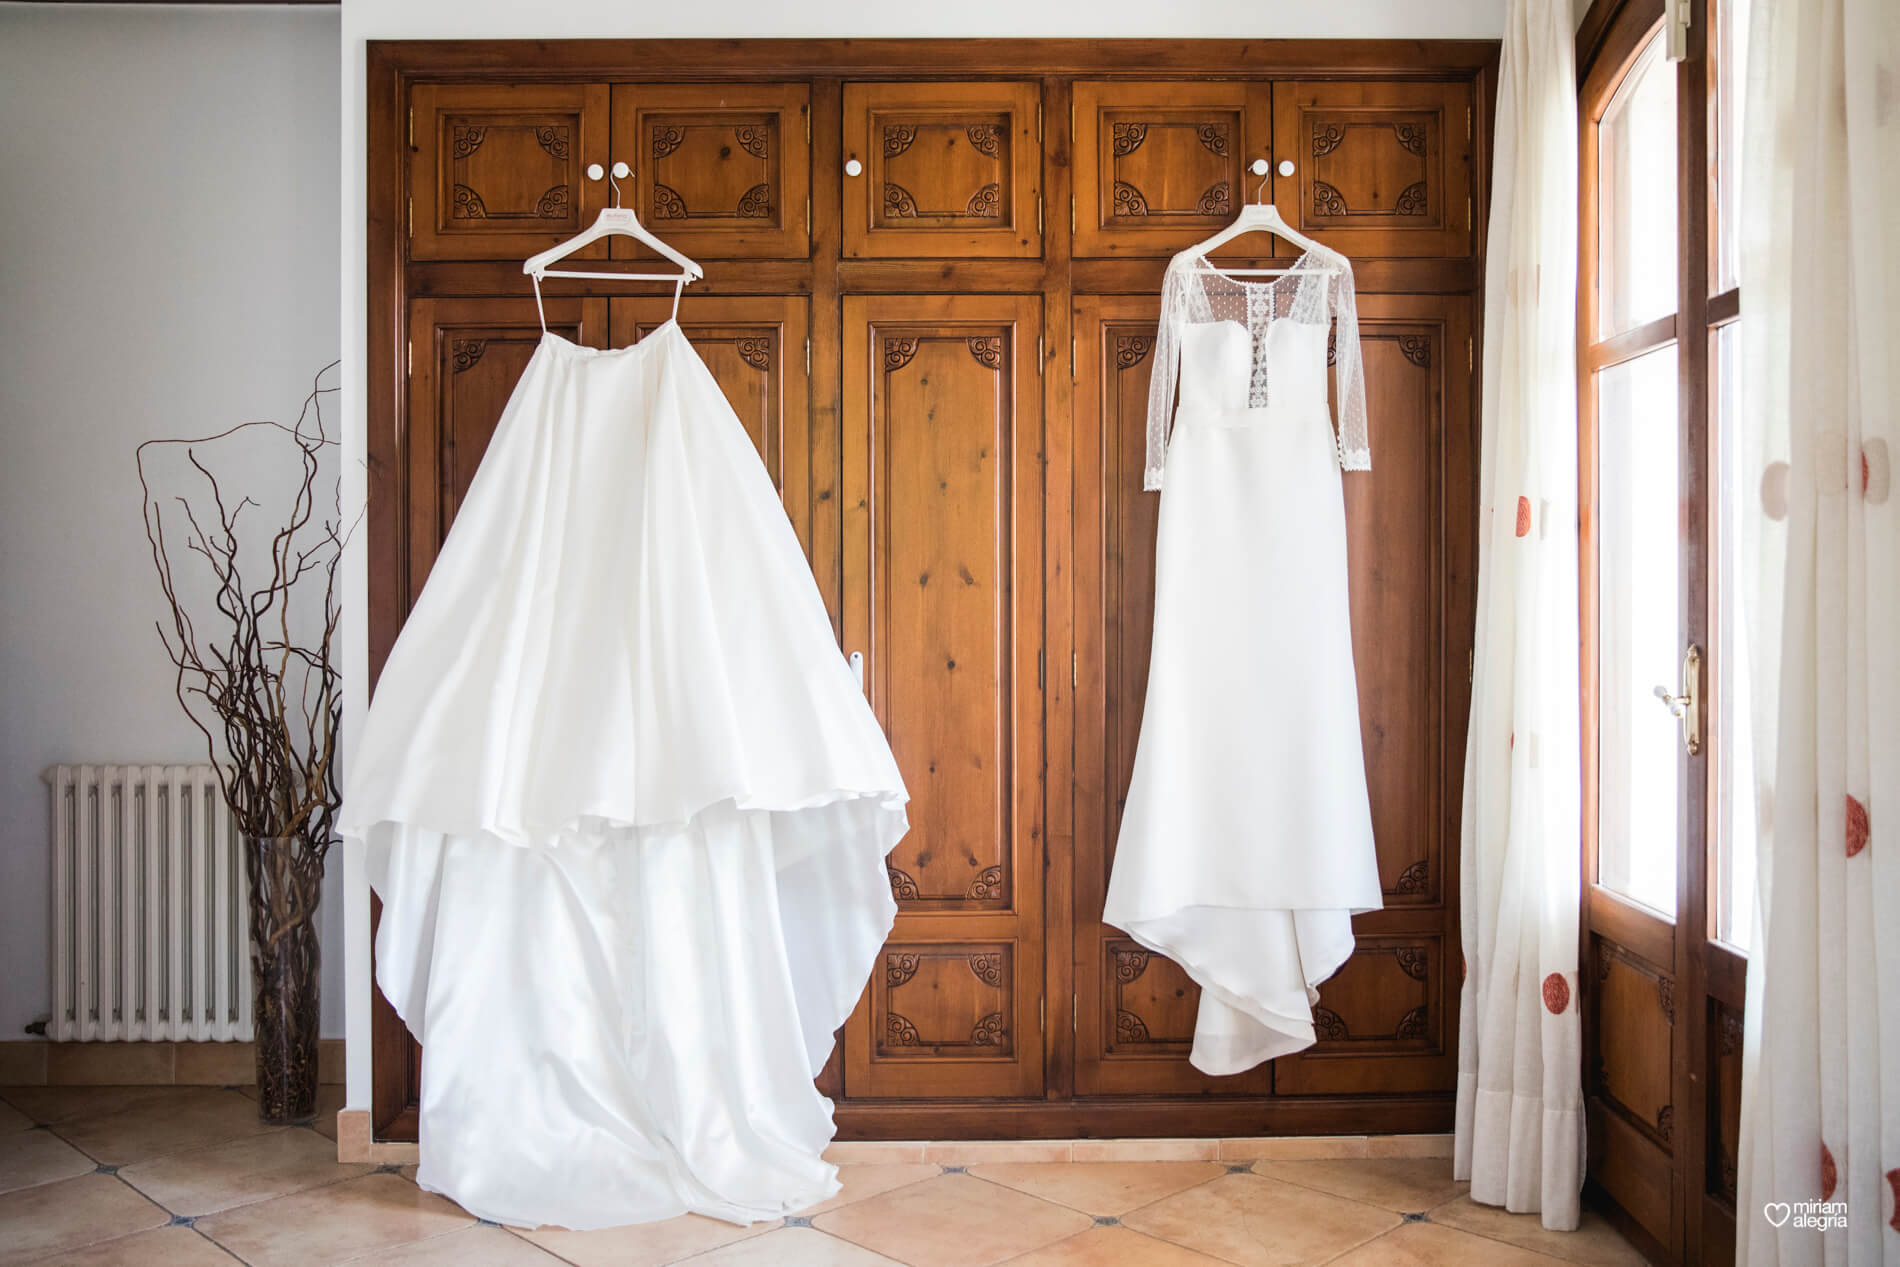 la-boda-de-alemc7-miriam-alegria-fotografos-boda-murcia-13